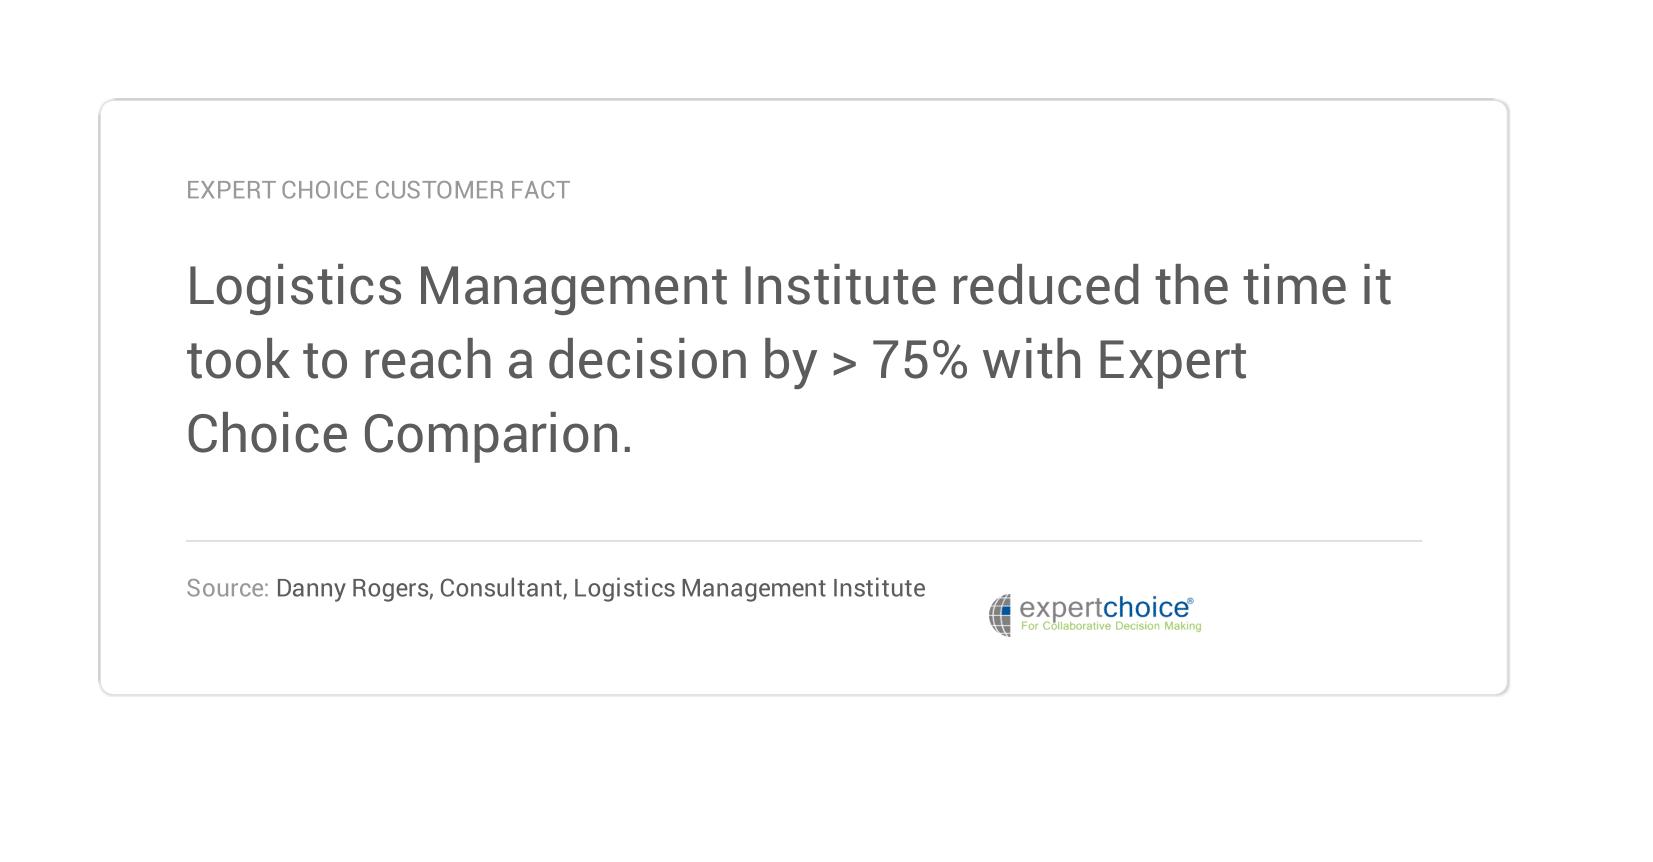 Expert Choice Customer fact